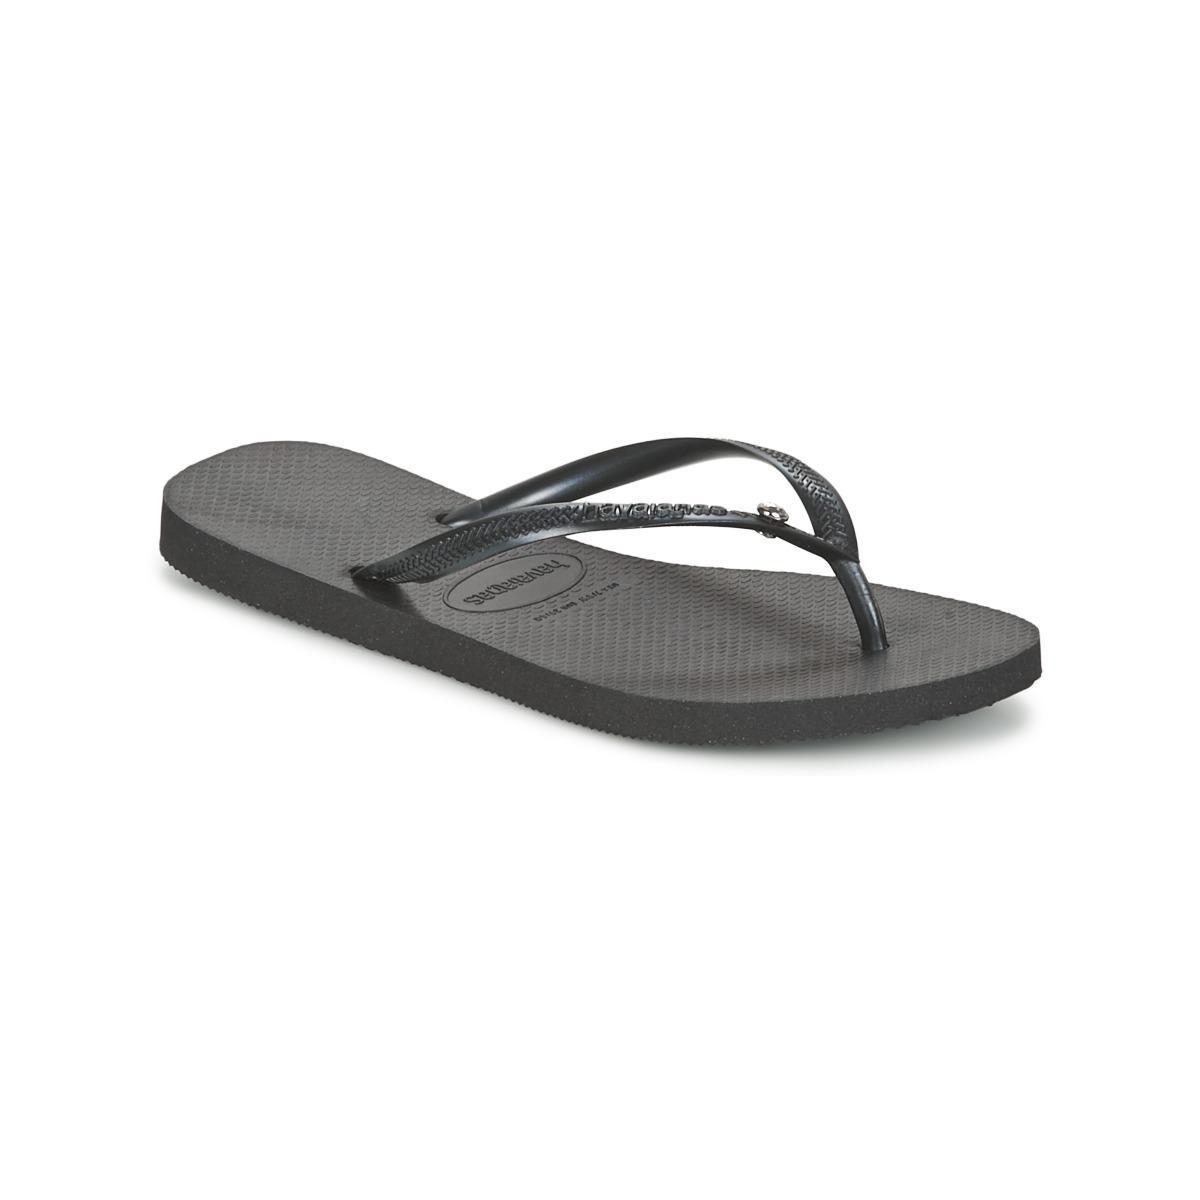 d805aa9477730e Havaianas Slim Crystal Glamour Women s Flip Flops   Sandals (shoes ...